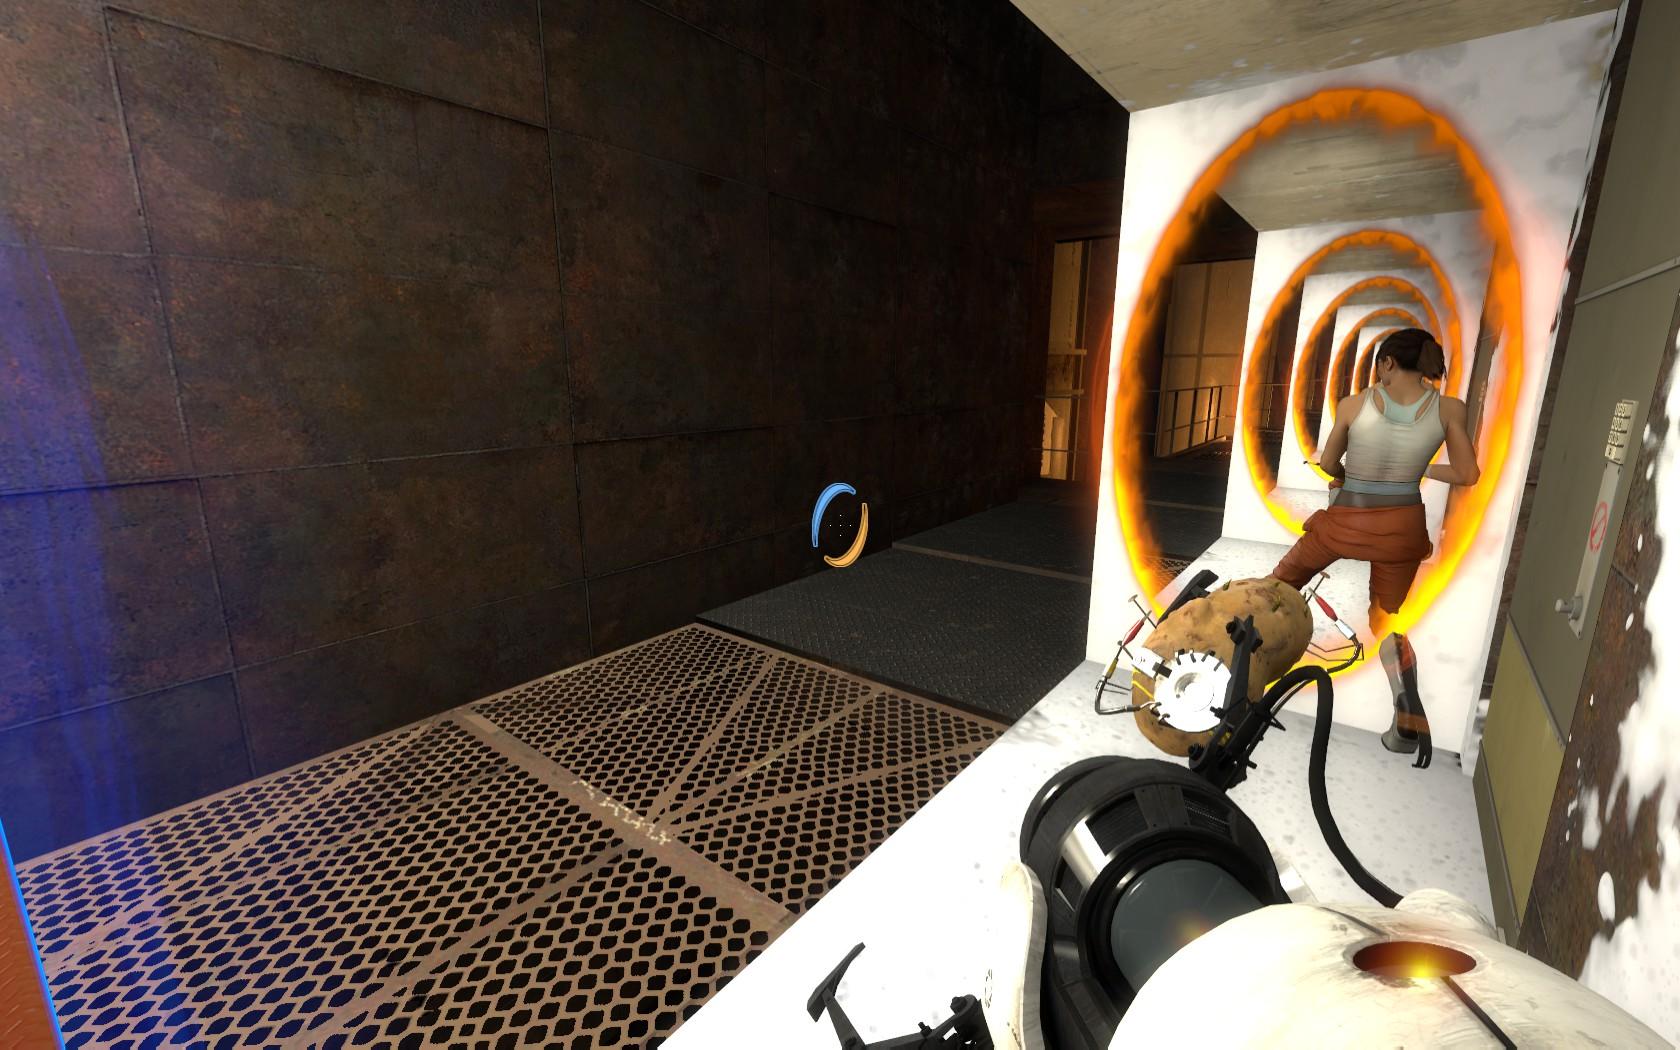 Portal 2 Review - Portals, Portals Everywhere - Newer Game Design